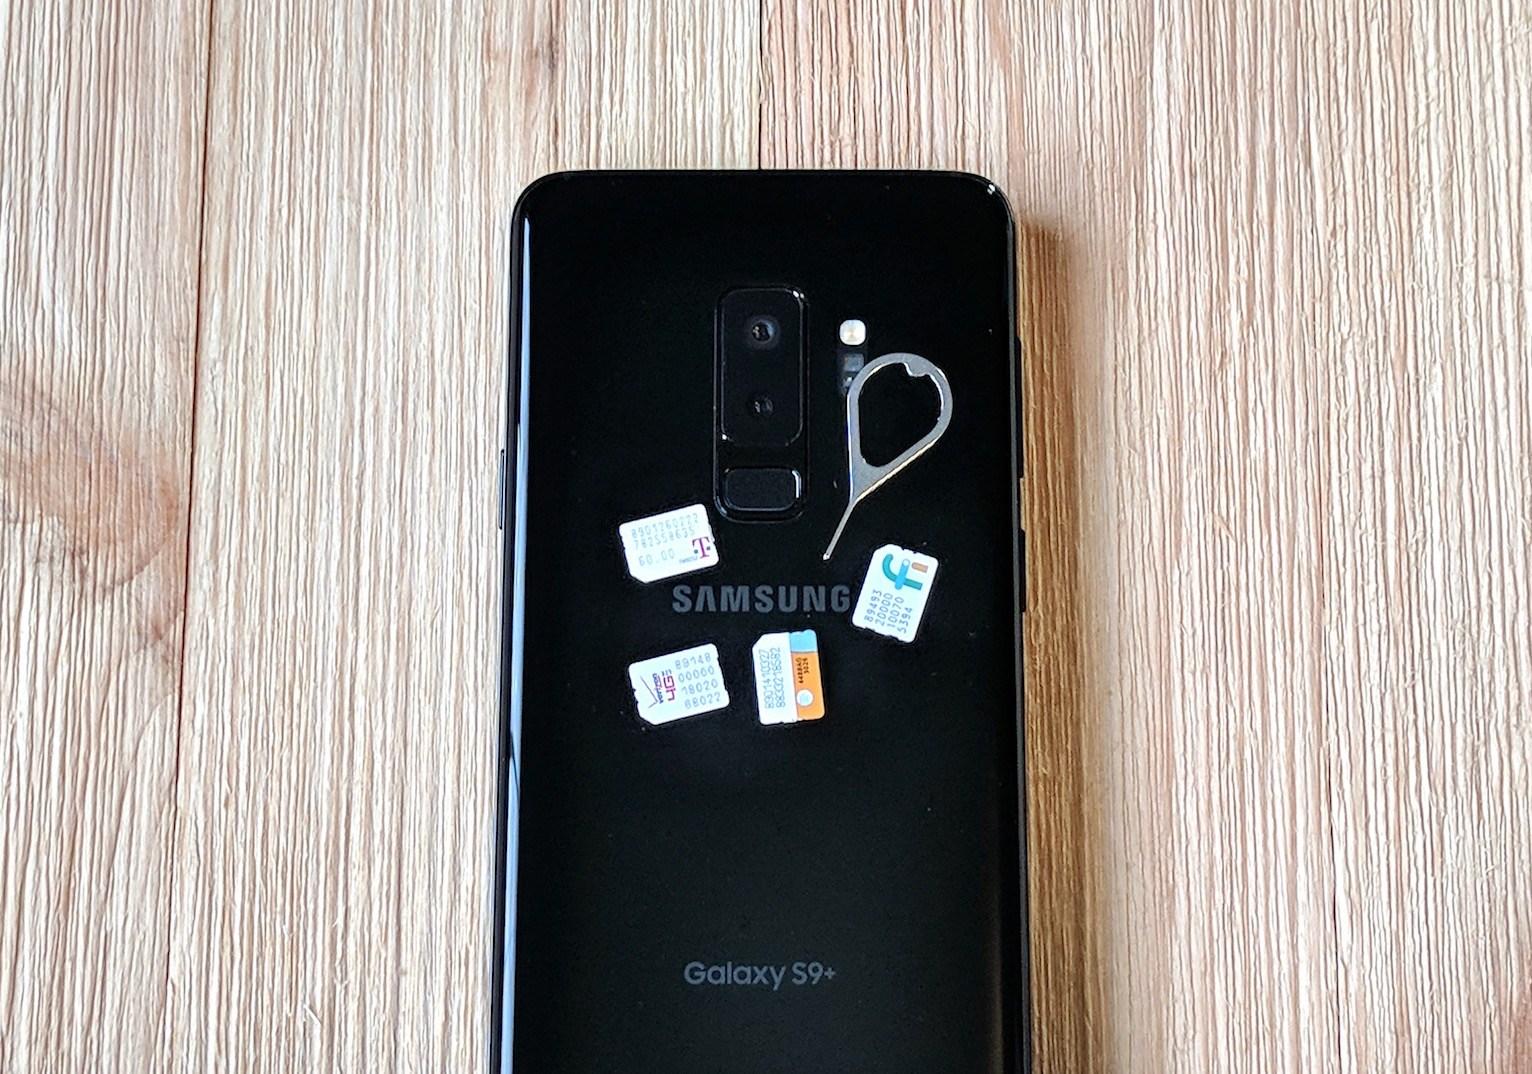 Change SIM Pin Code on Galaxy S9